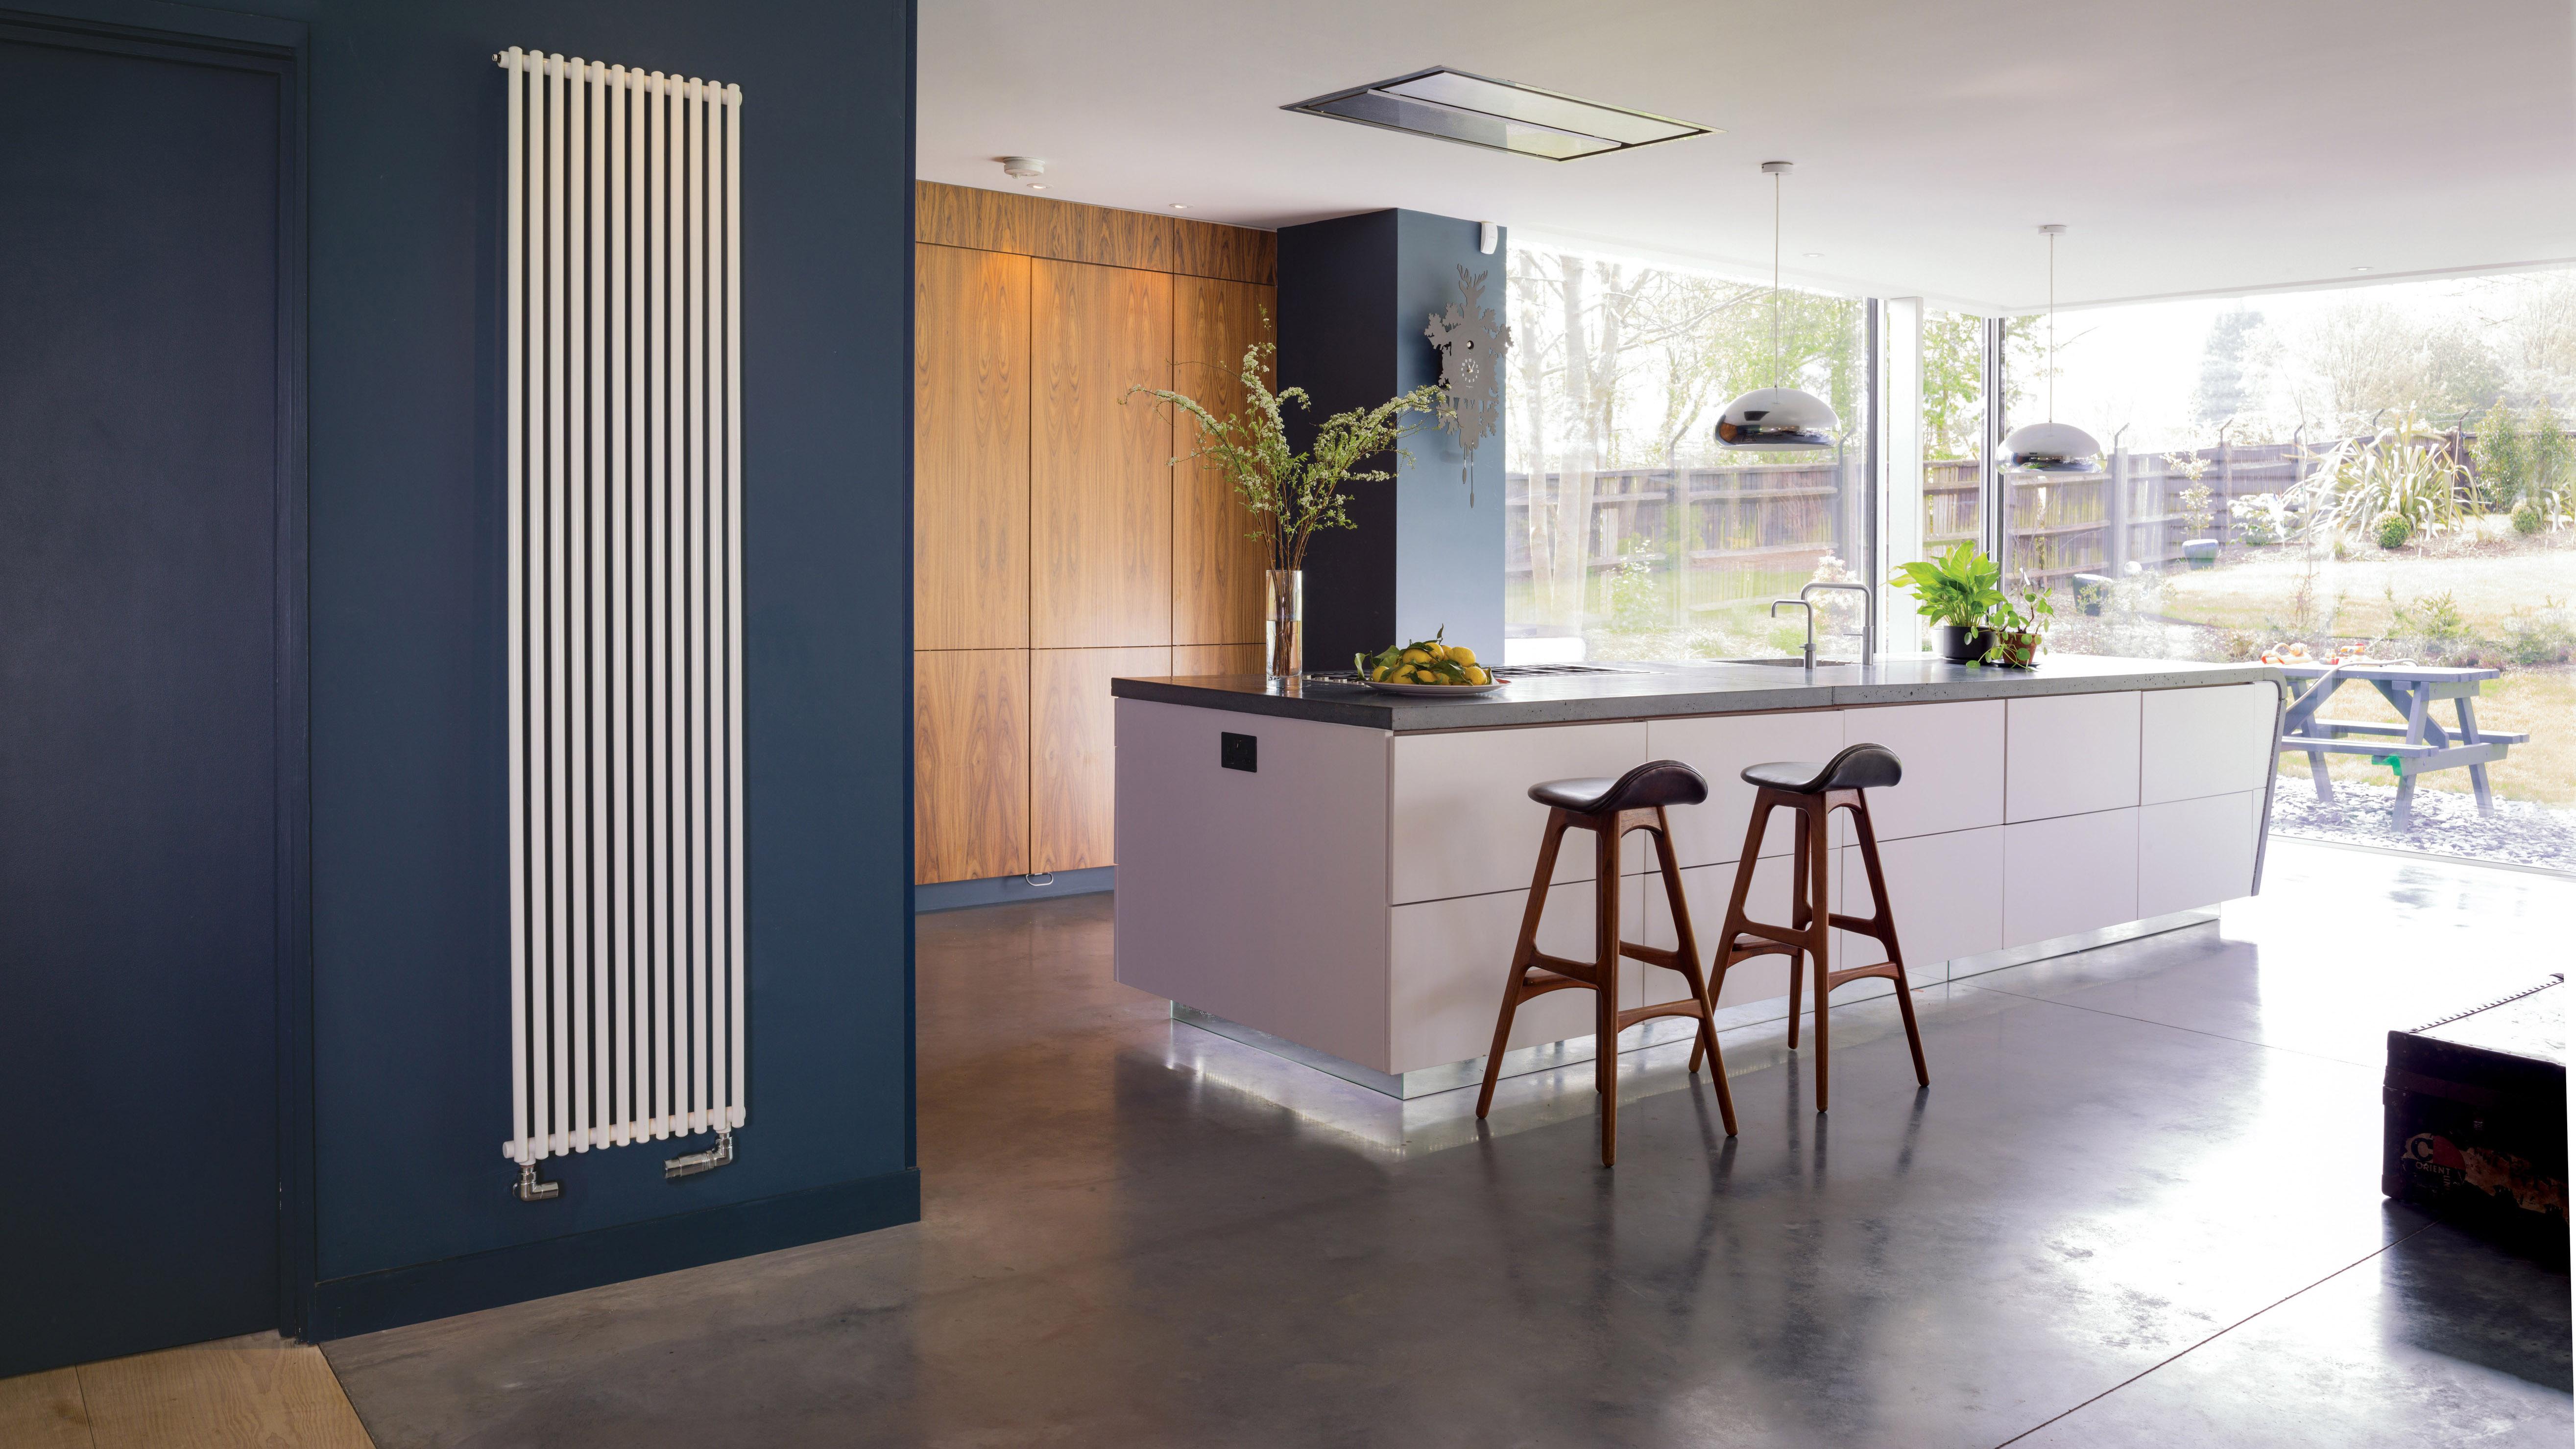 Heating a kitchen the best ways to warm your kitchen space ...